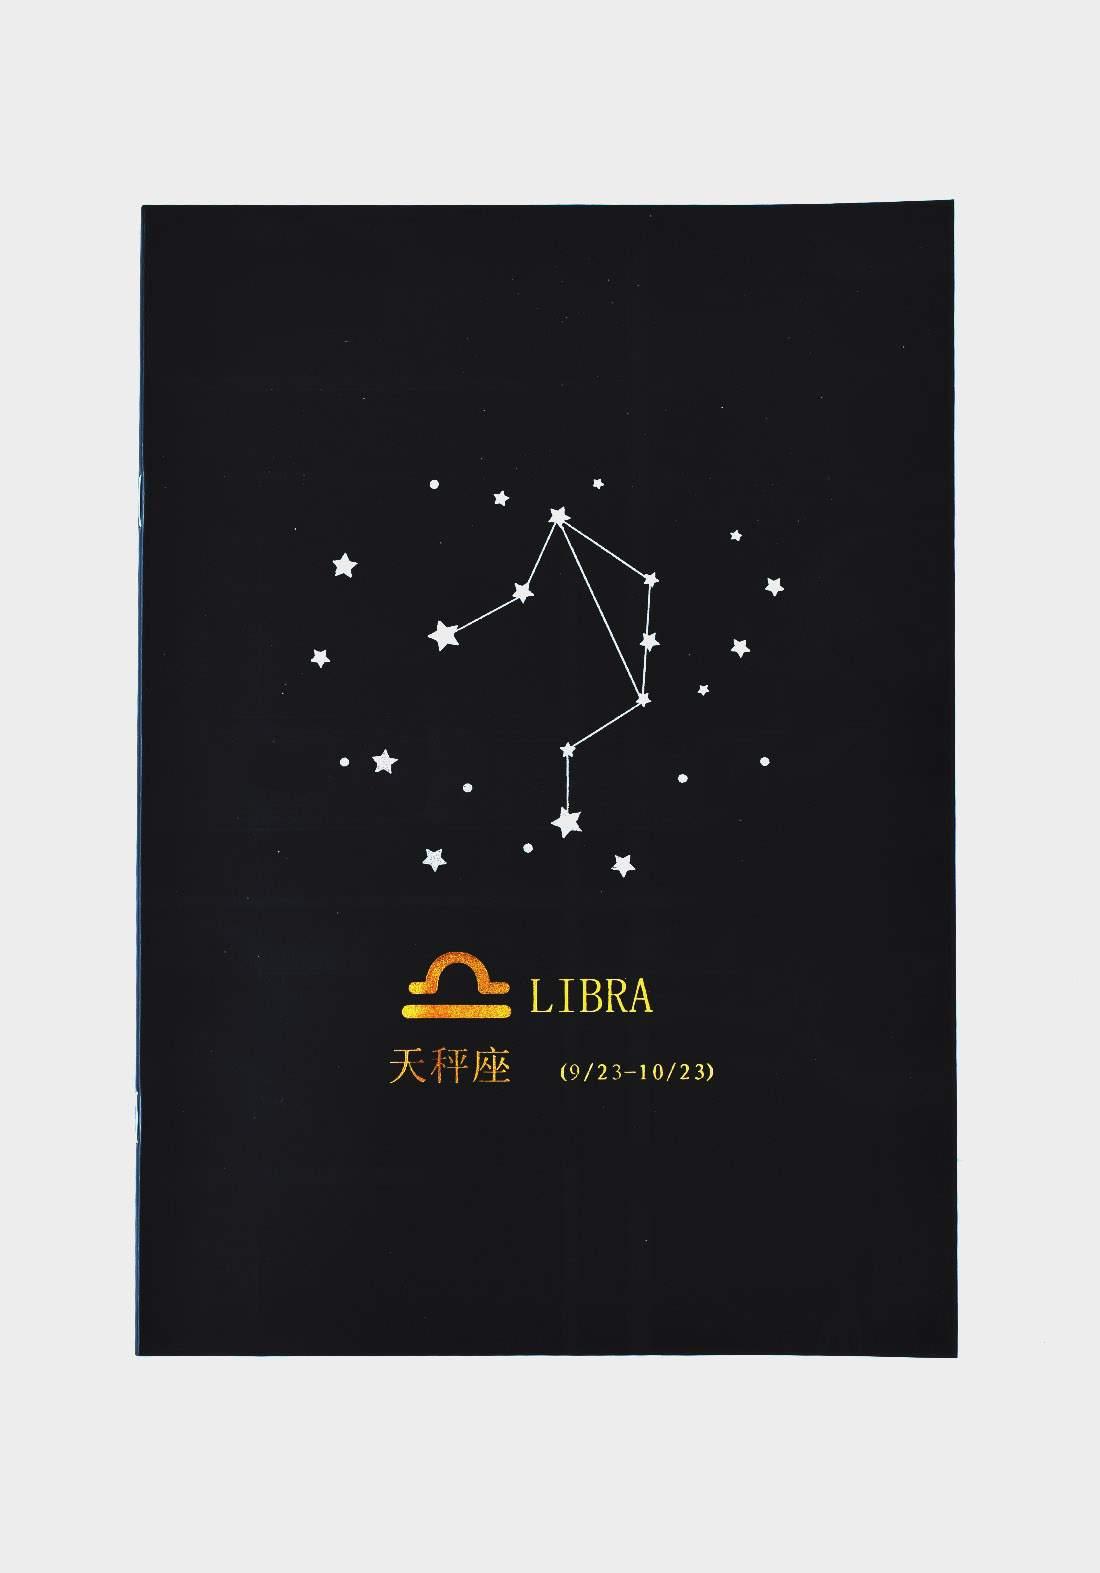 Small Black Drawing Book 24 Sheets-Libra دفتر رسم اسود صغير بطبعة برج الميزان